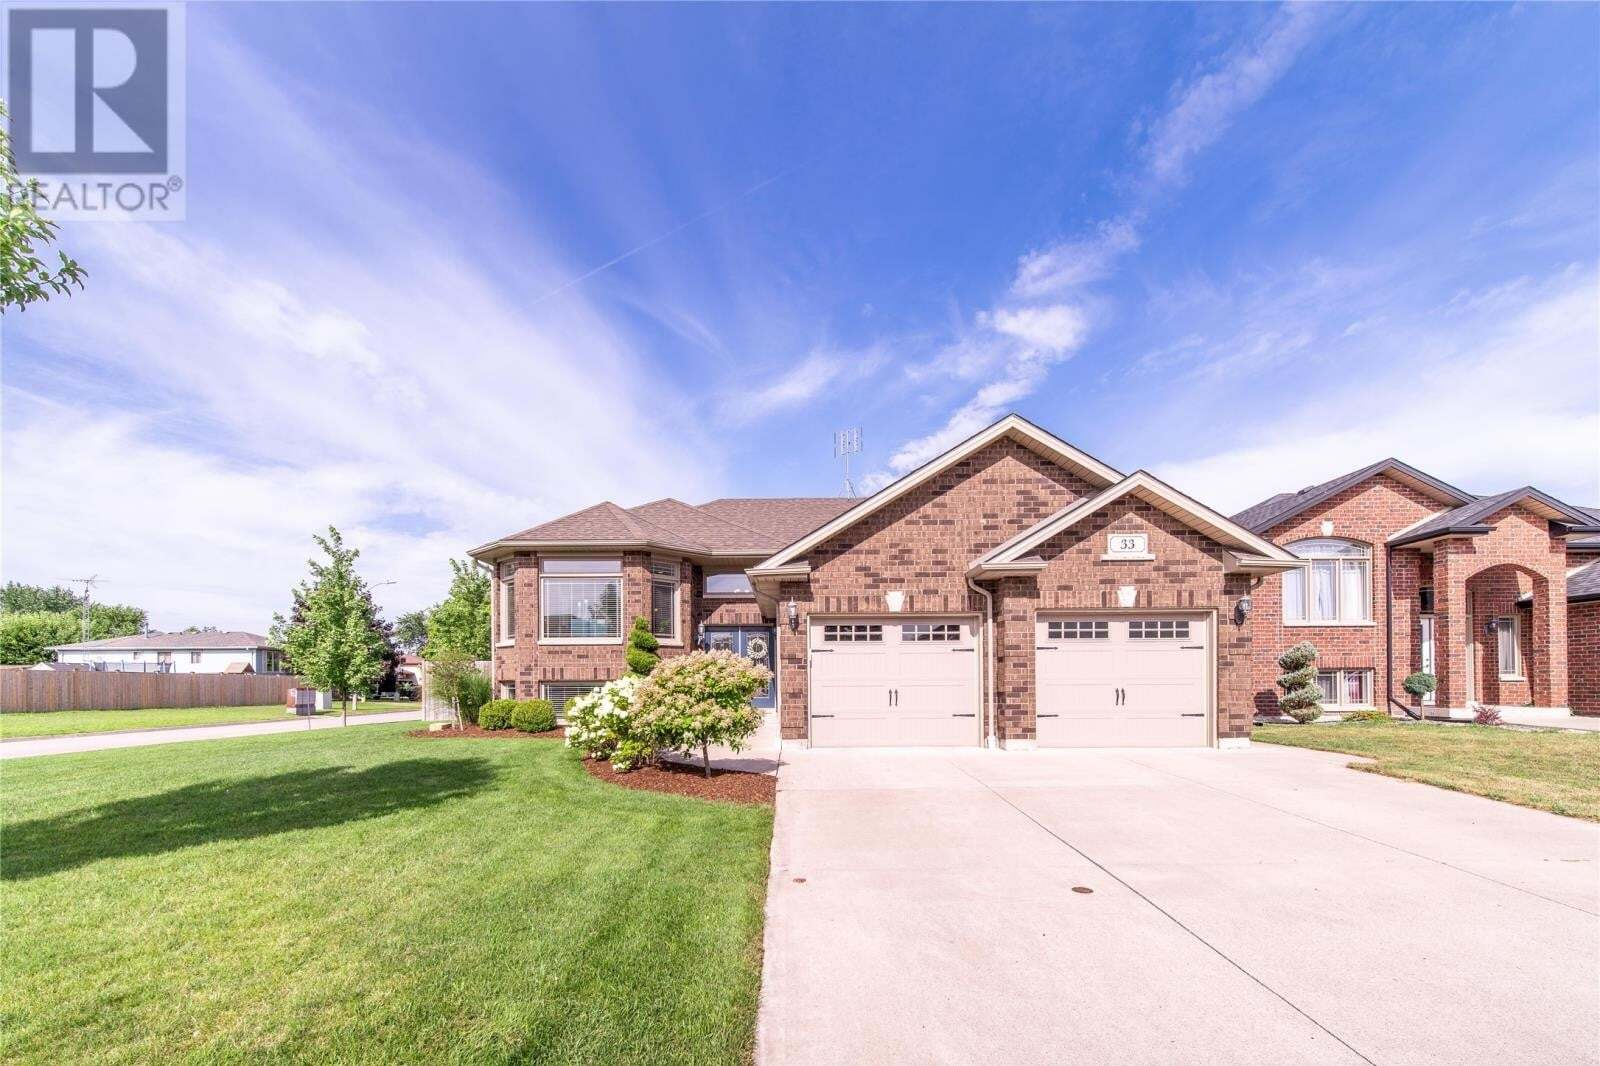 House for sale at 33 Antonio Ct Leamington Ontario - MLS: 20009575